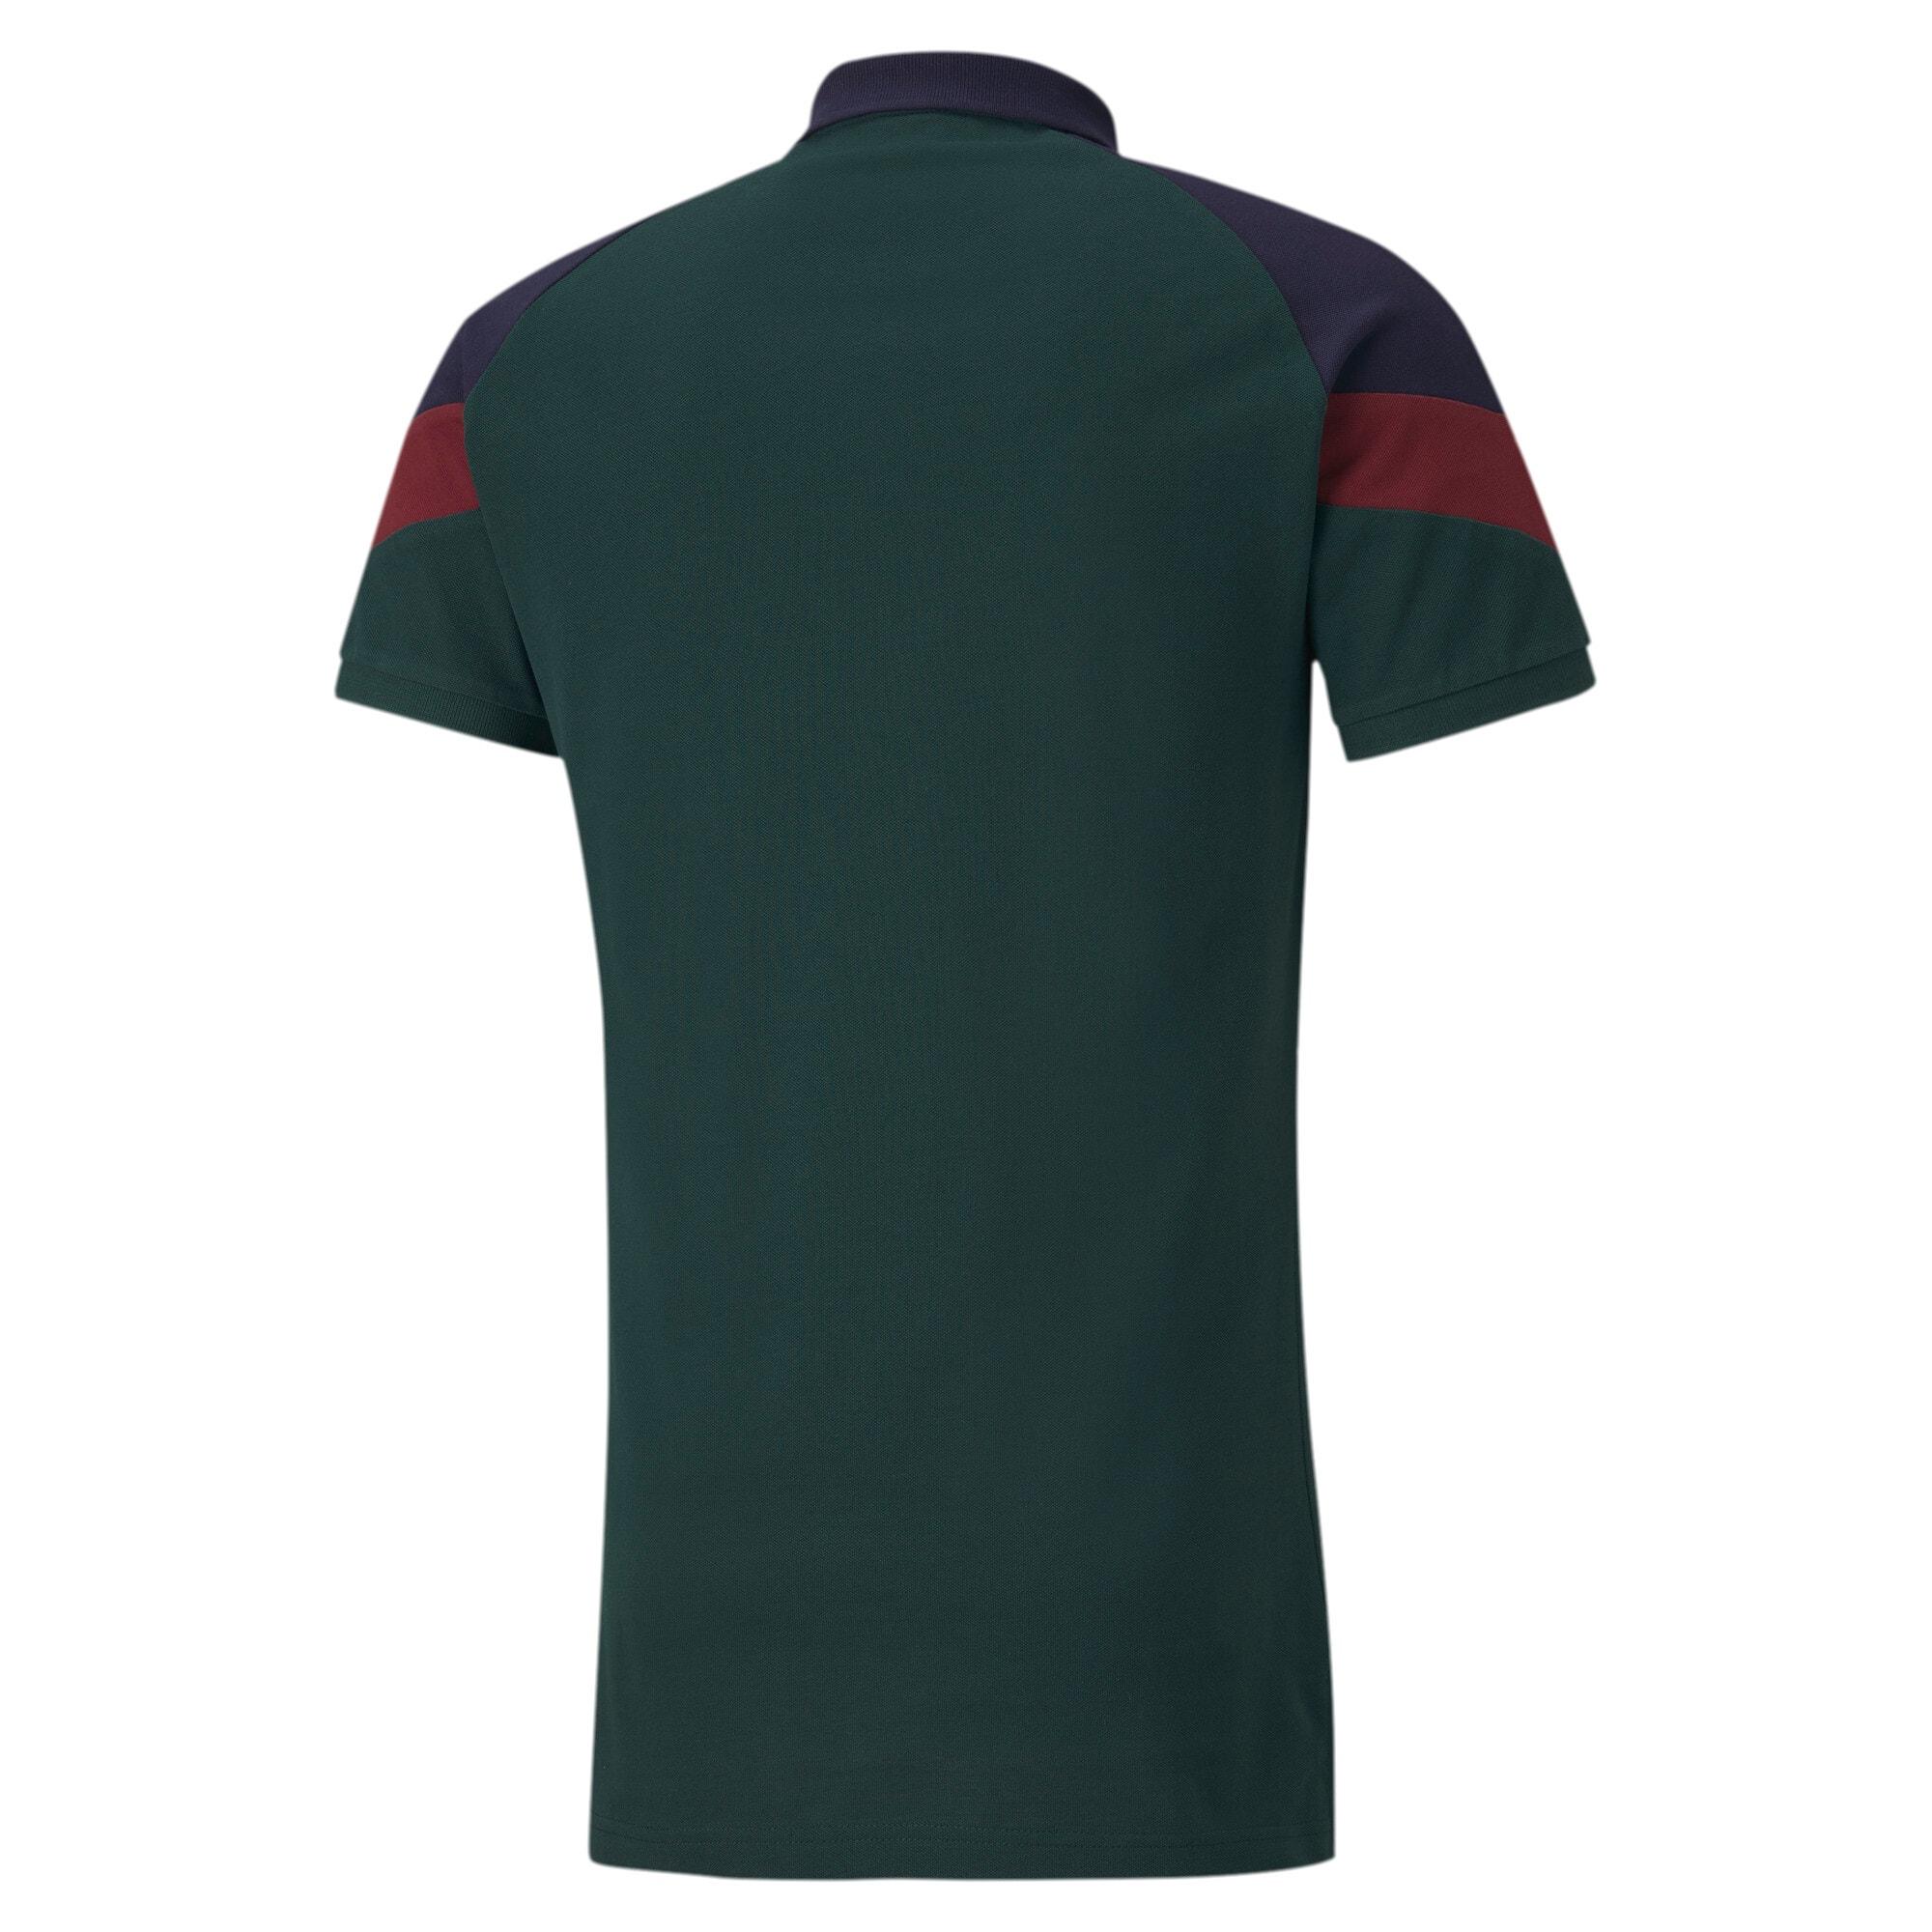 Thumbnail 2 of FIGC Iconic MCS Men's Polo, Ponderosa Pine-peacoat, medium